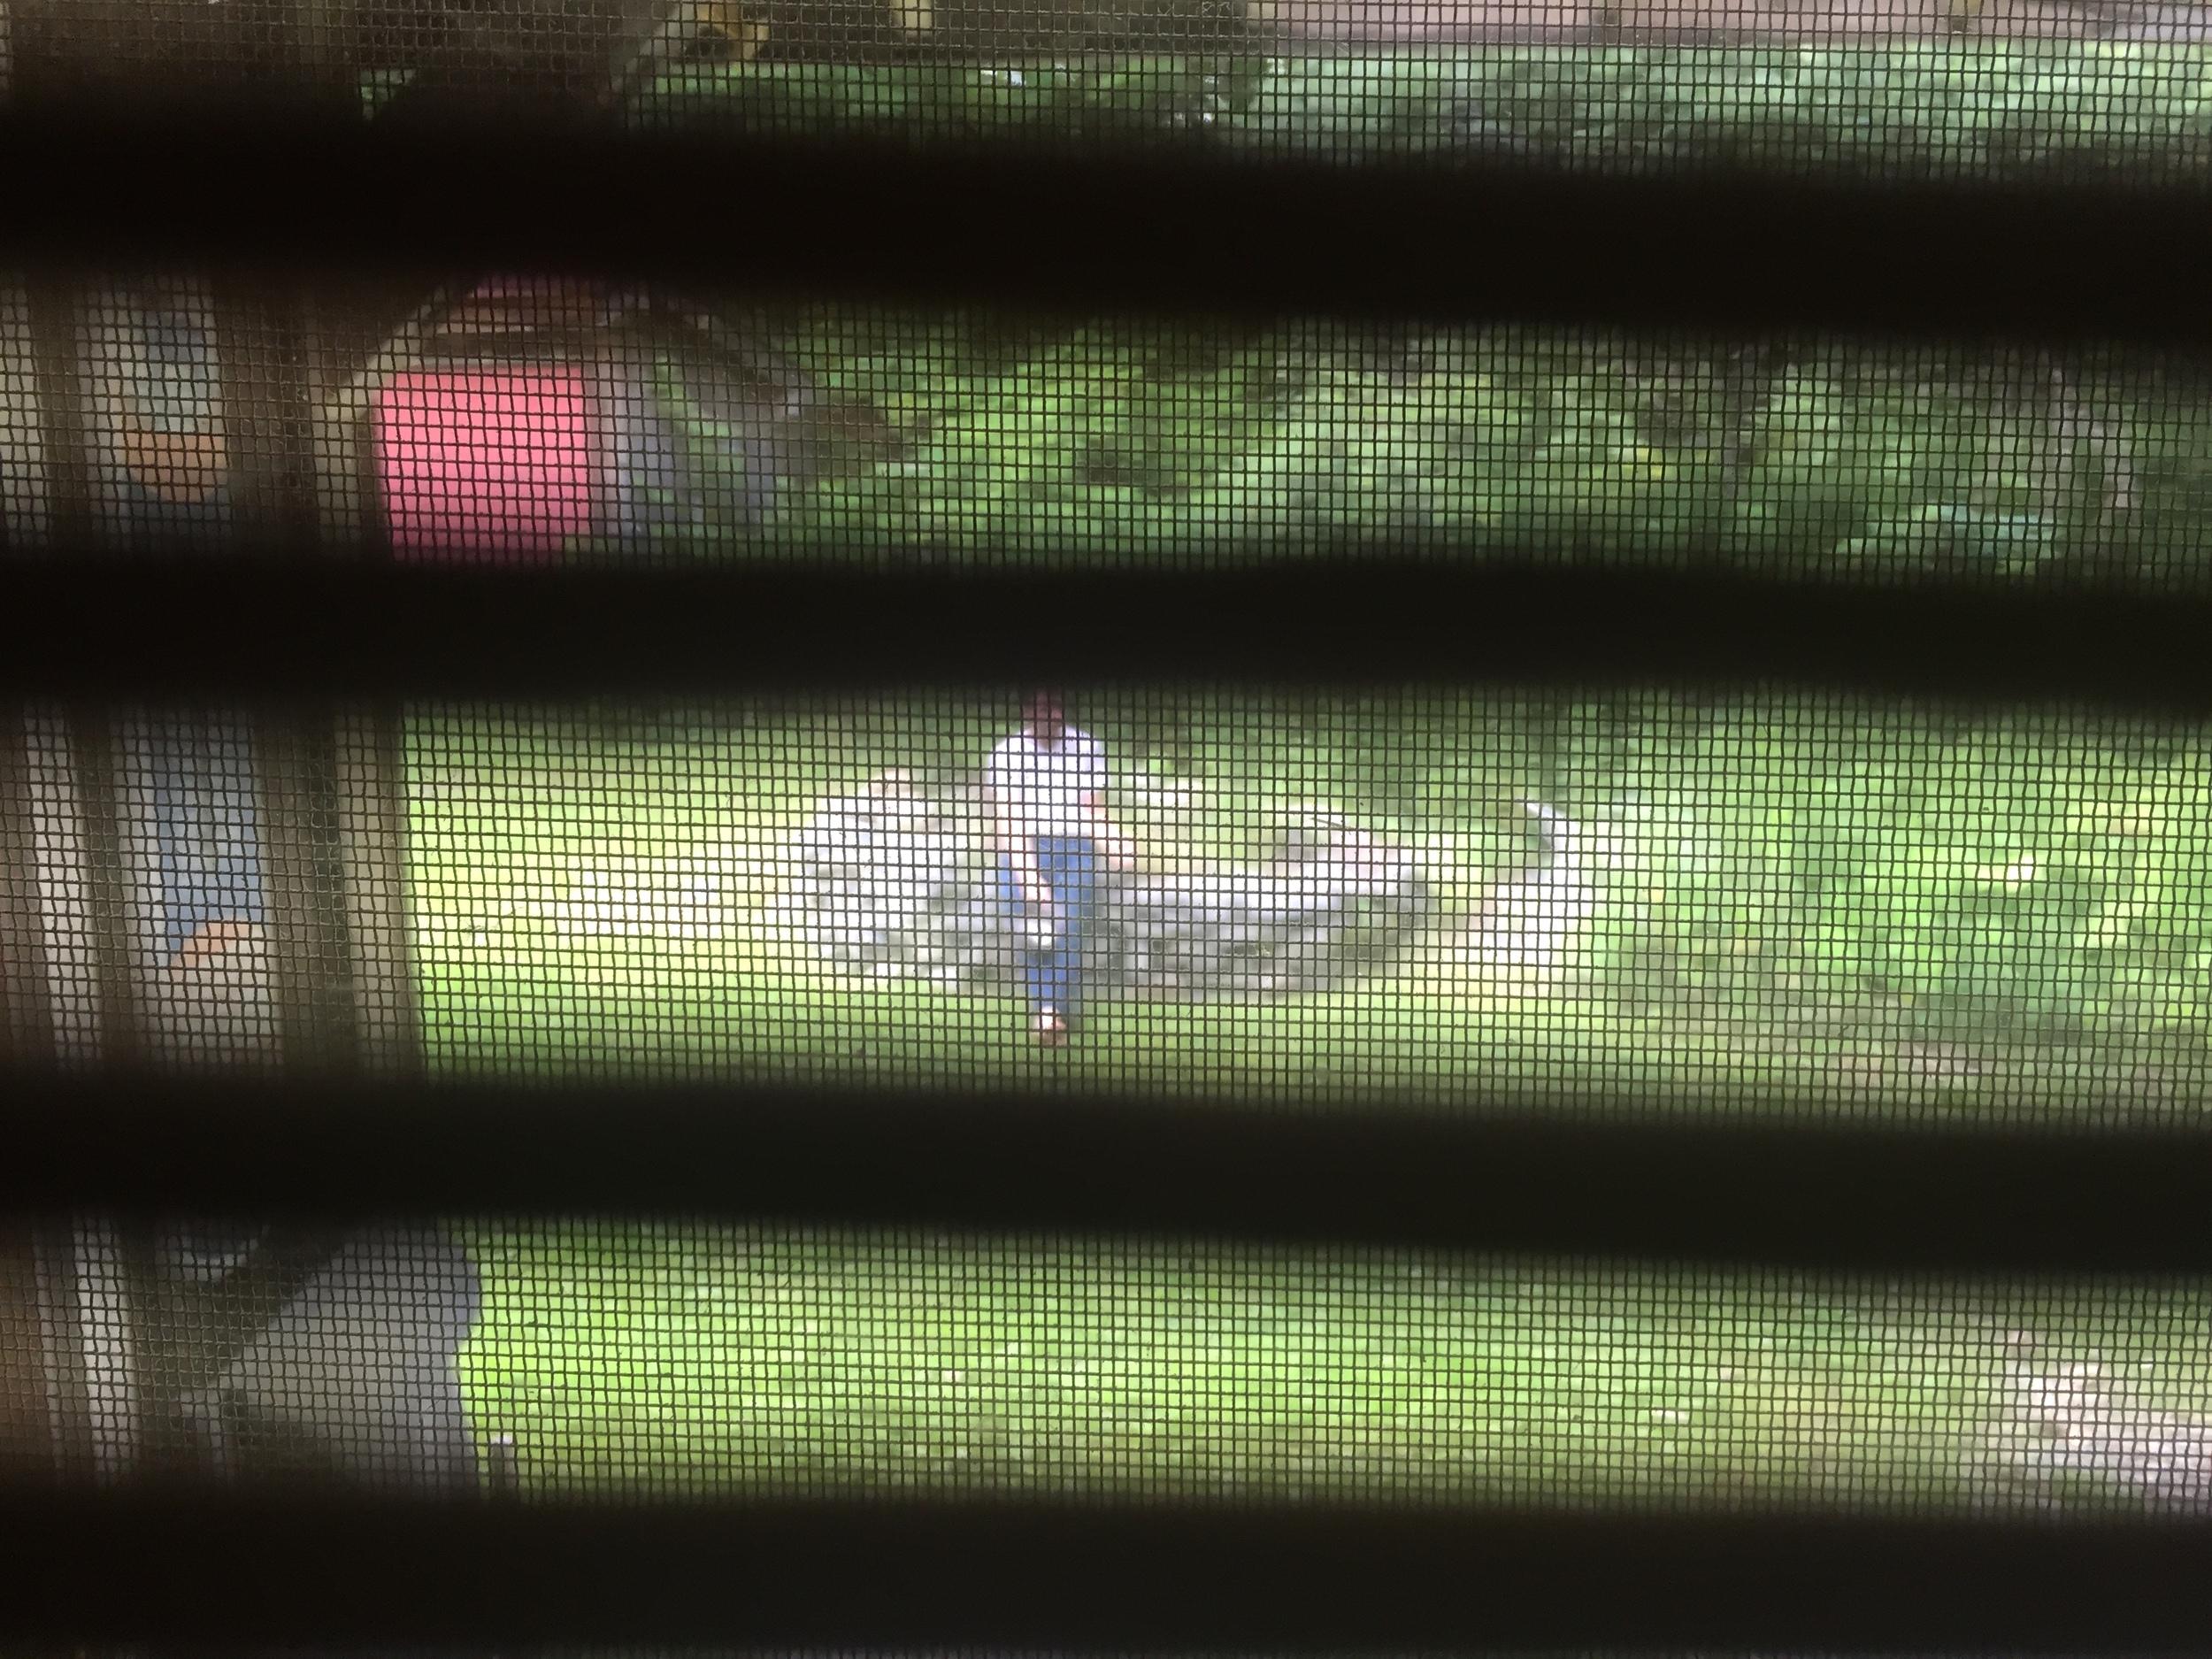 ricky thru blinds.jpg